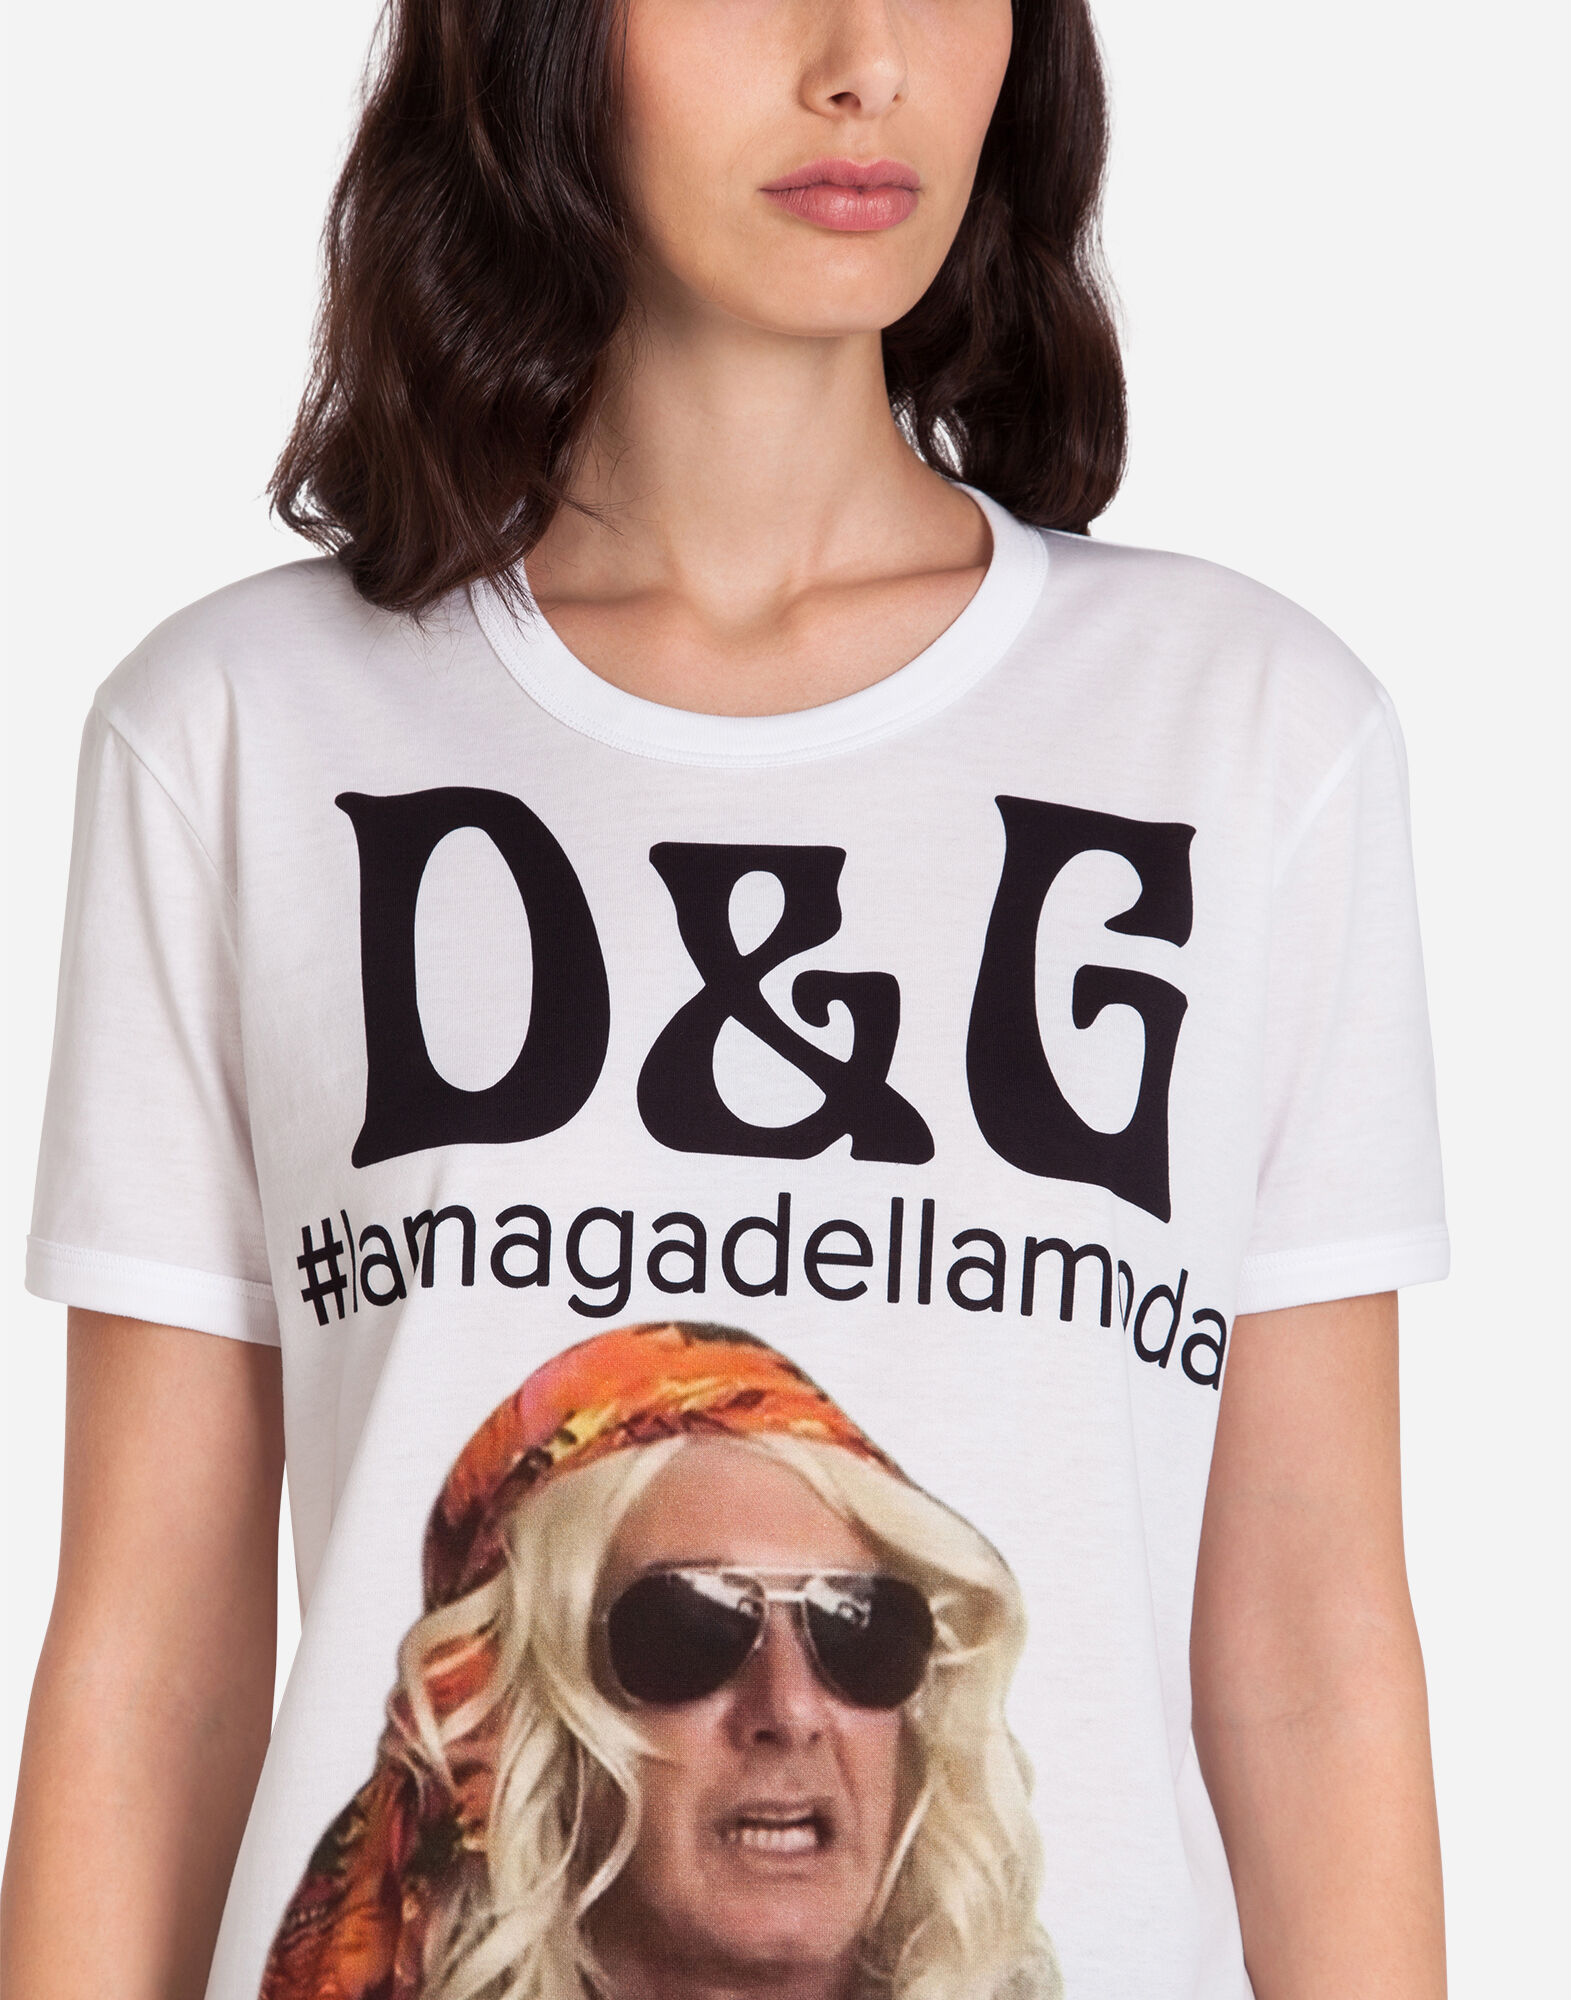 T-SHIRT WITH #LAMAGADELLAMODA PRINT